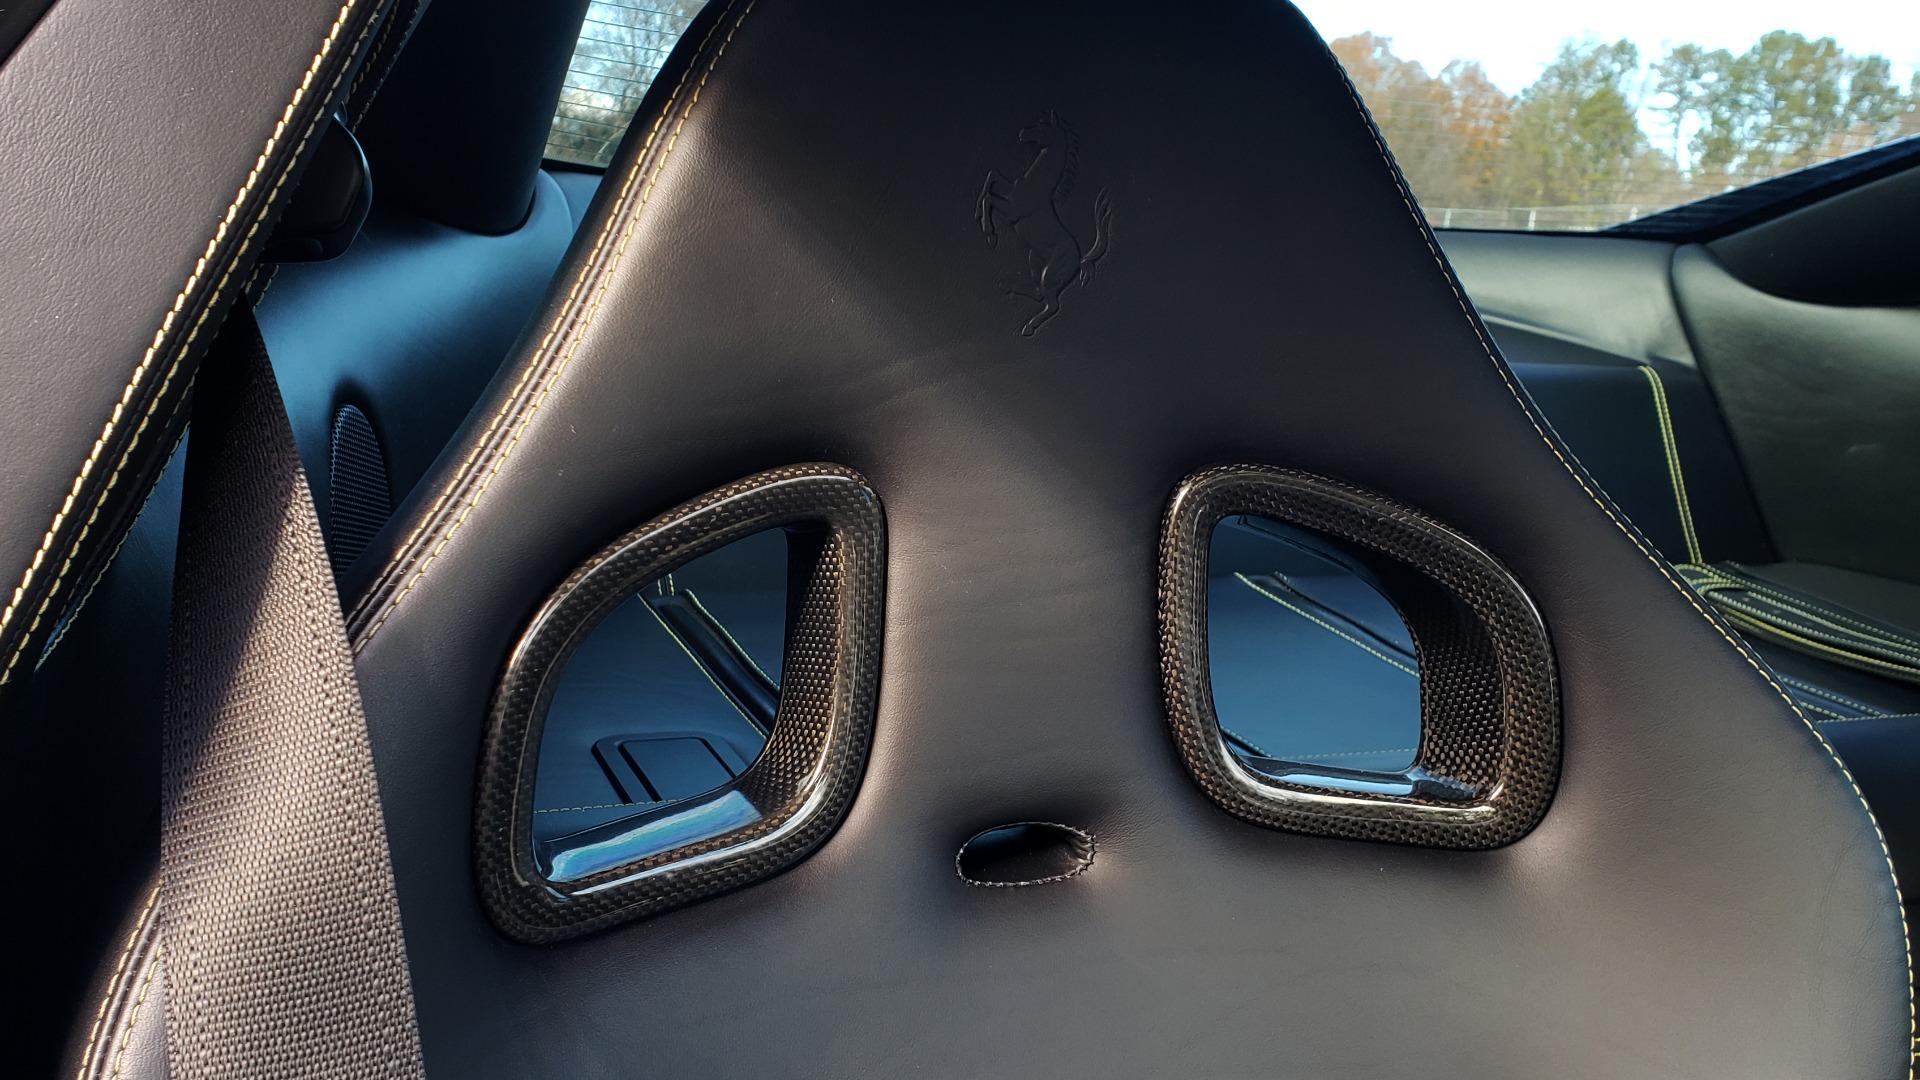 Used 2007 Ferrari 599 GTB FIORANO HGTE / V12 / F1 TRANS / NAV / BOSE / CUSTOM WHEELS for sale $109,999 at Formula Imports in Charlotte NC 28227 99